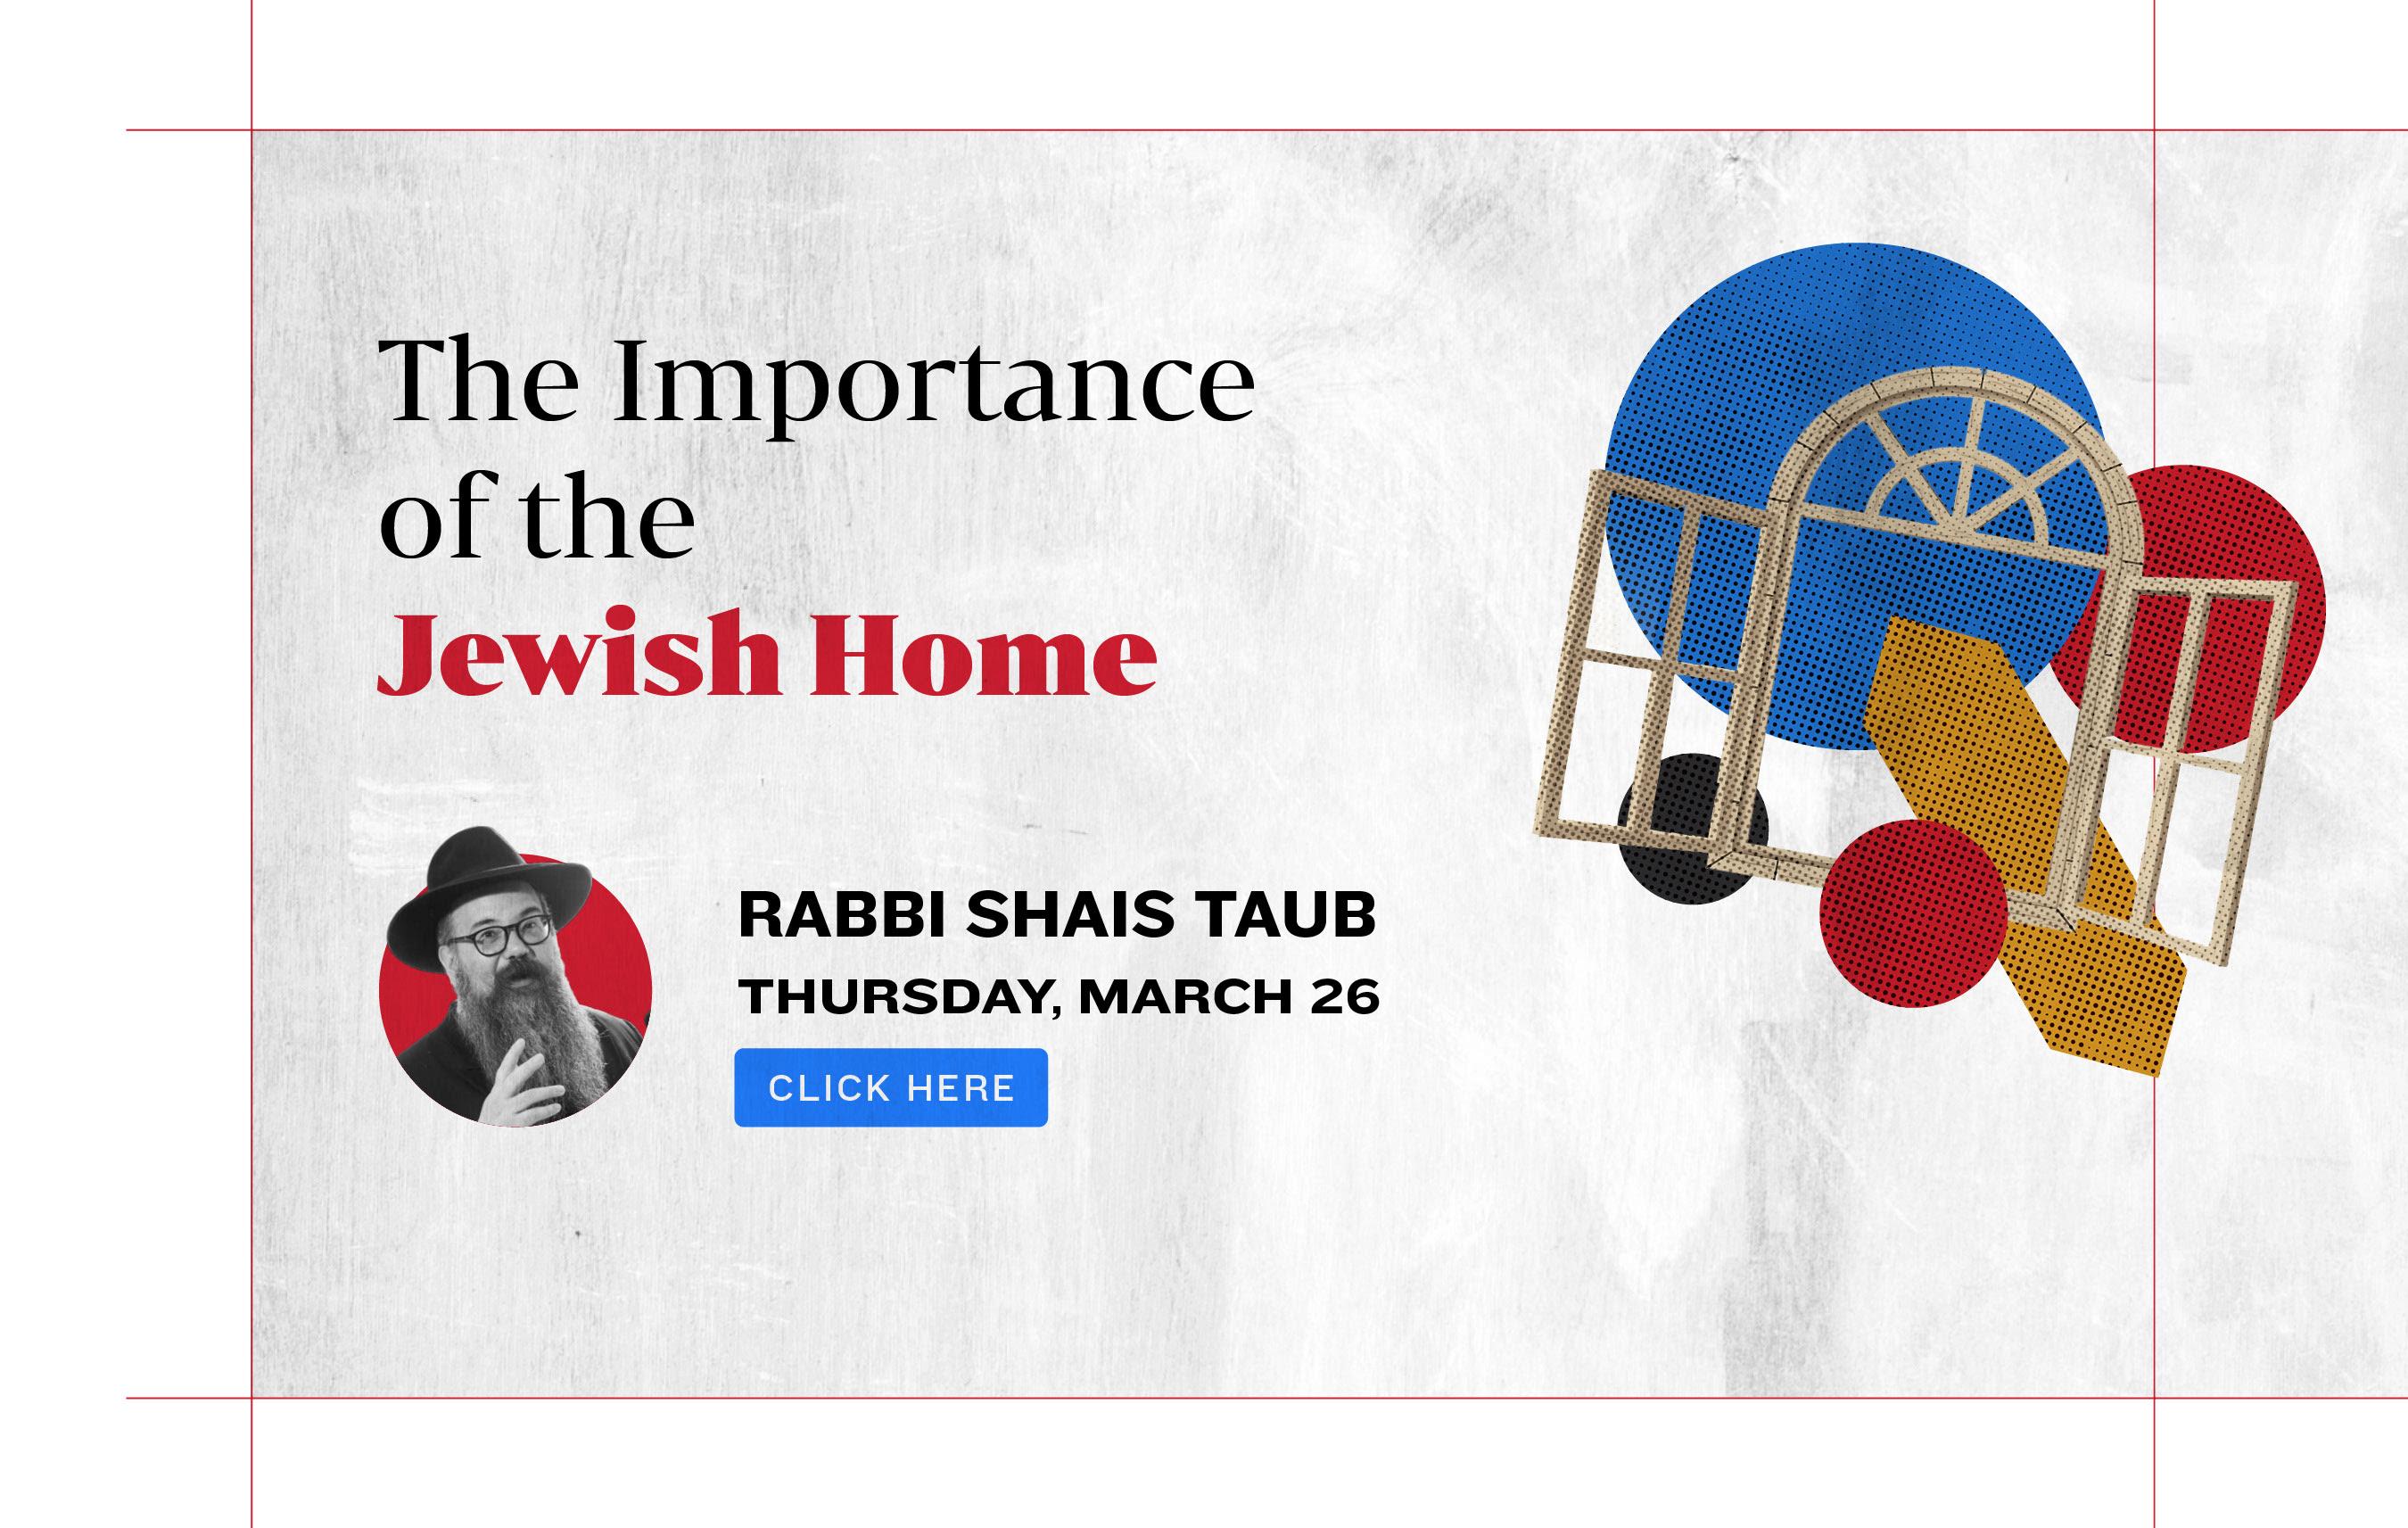 The Importance of the Jewish Home. Rabbi Shais Taub